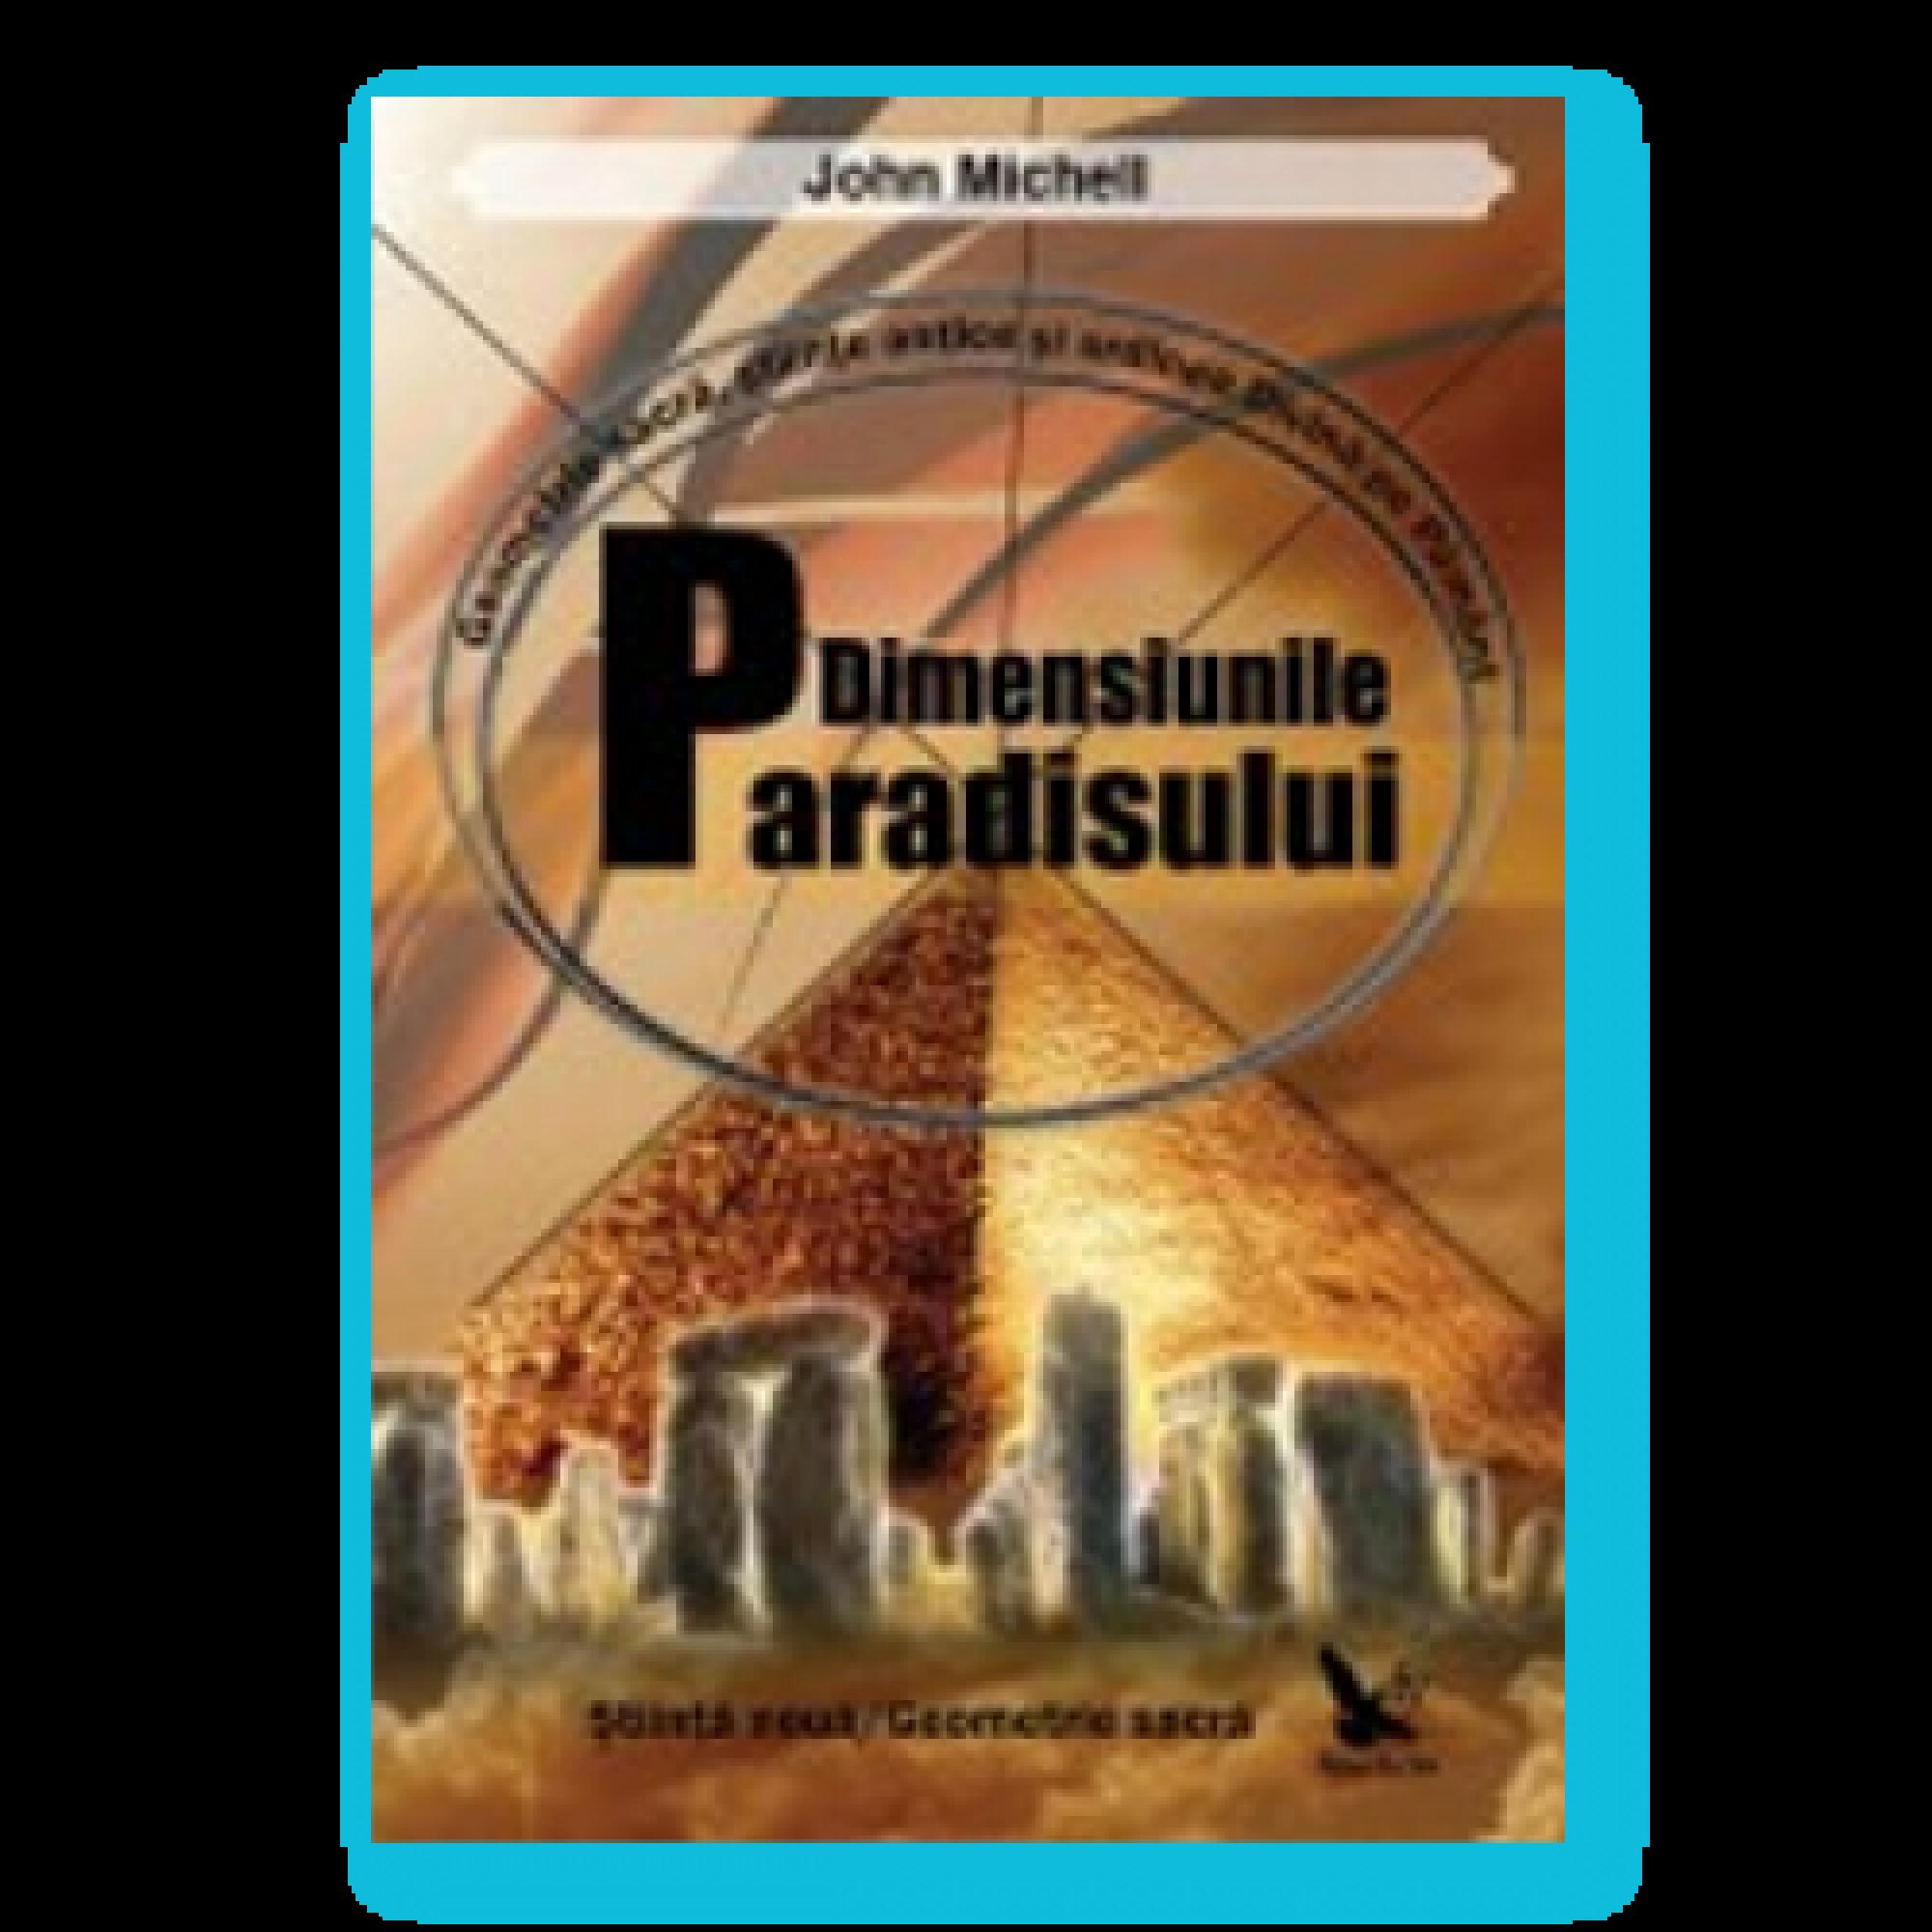 Dimensiunile paradisului; John Michell